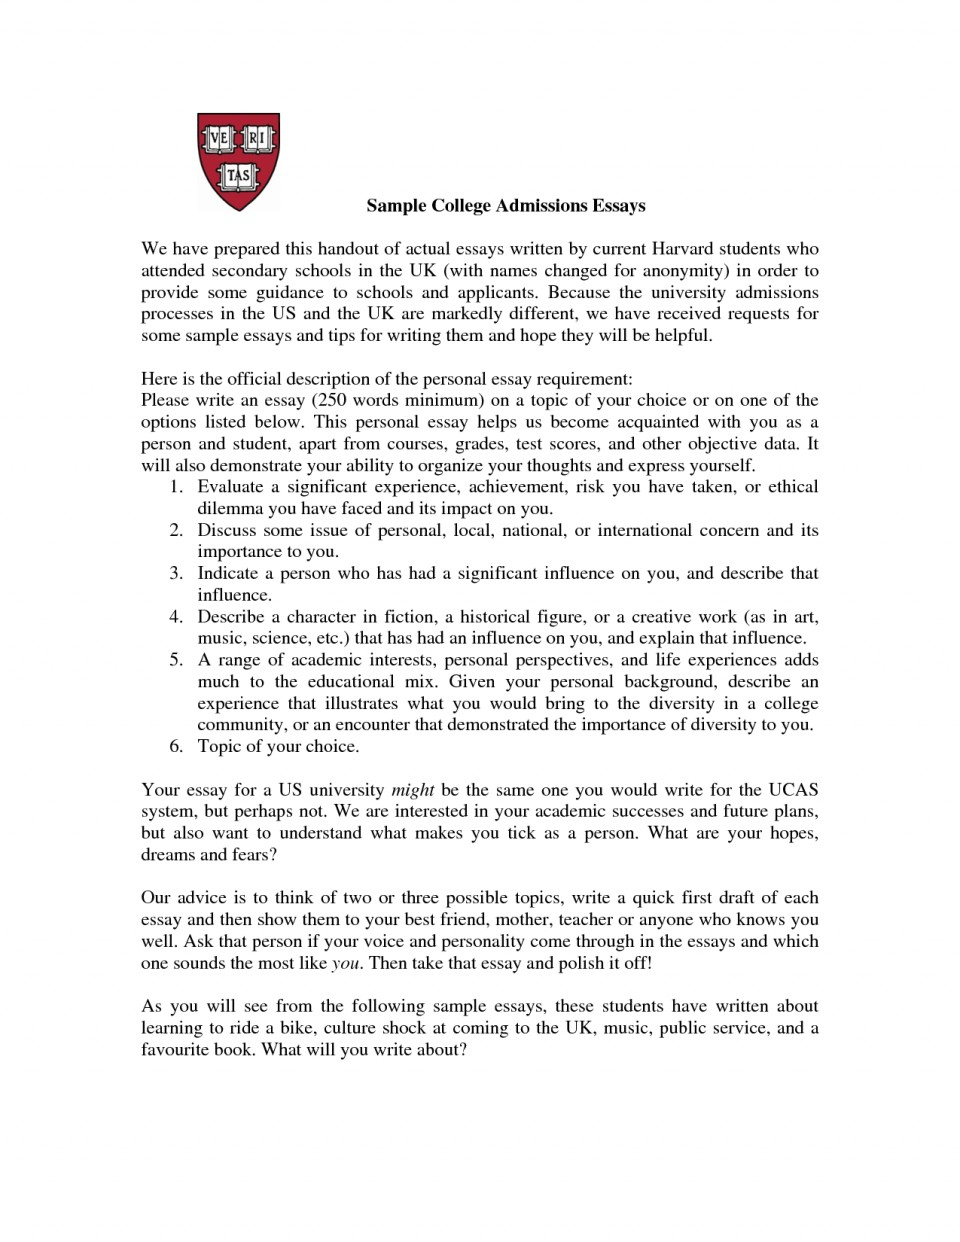 Graduate school admissions essay header